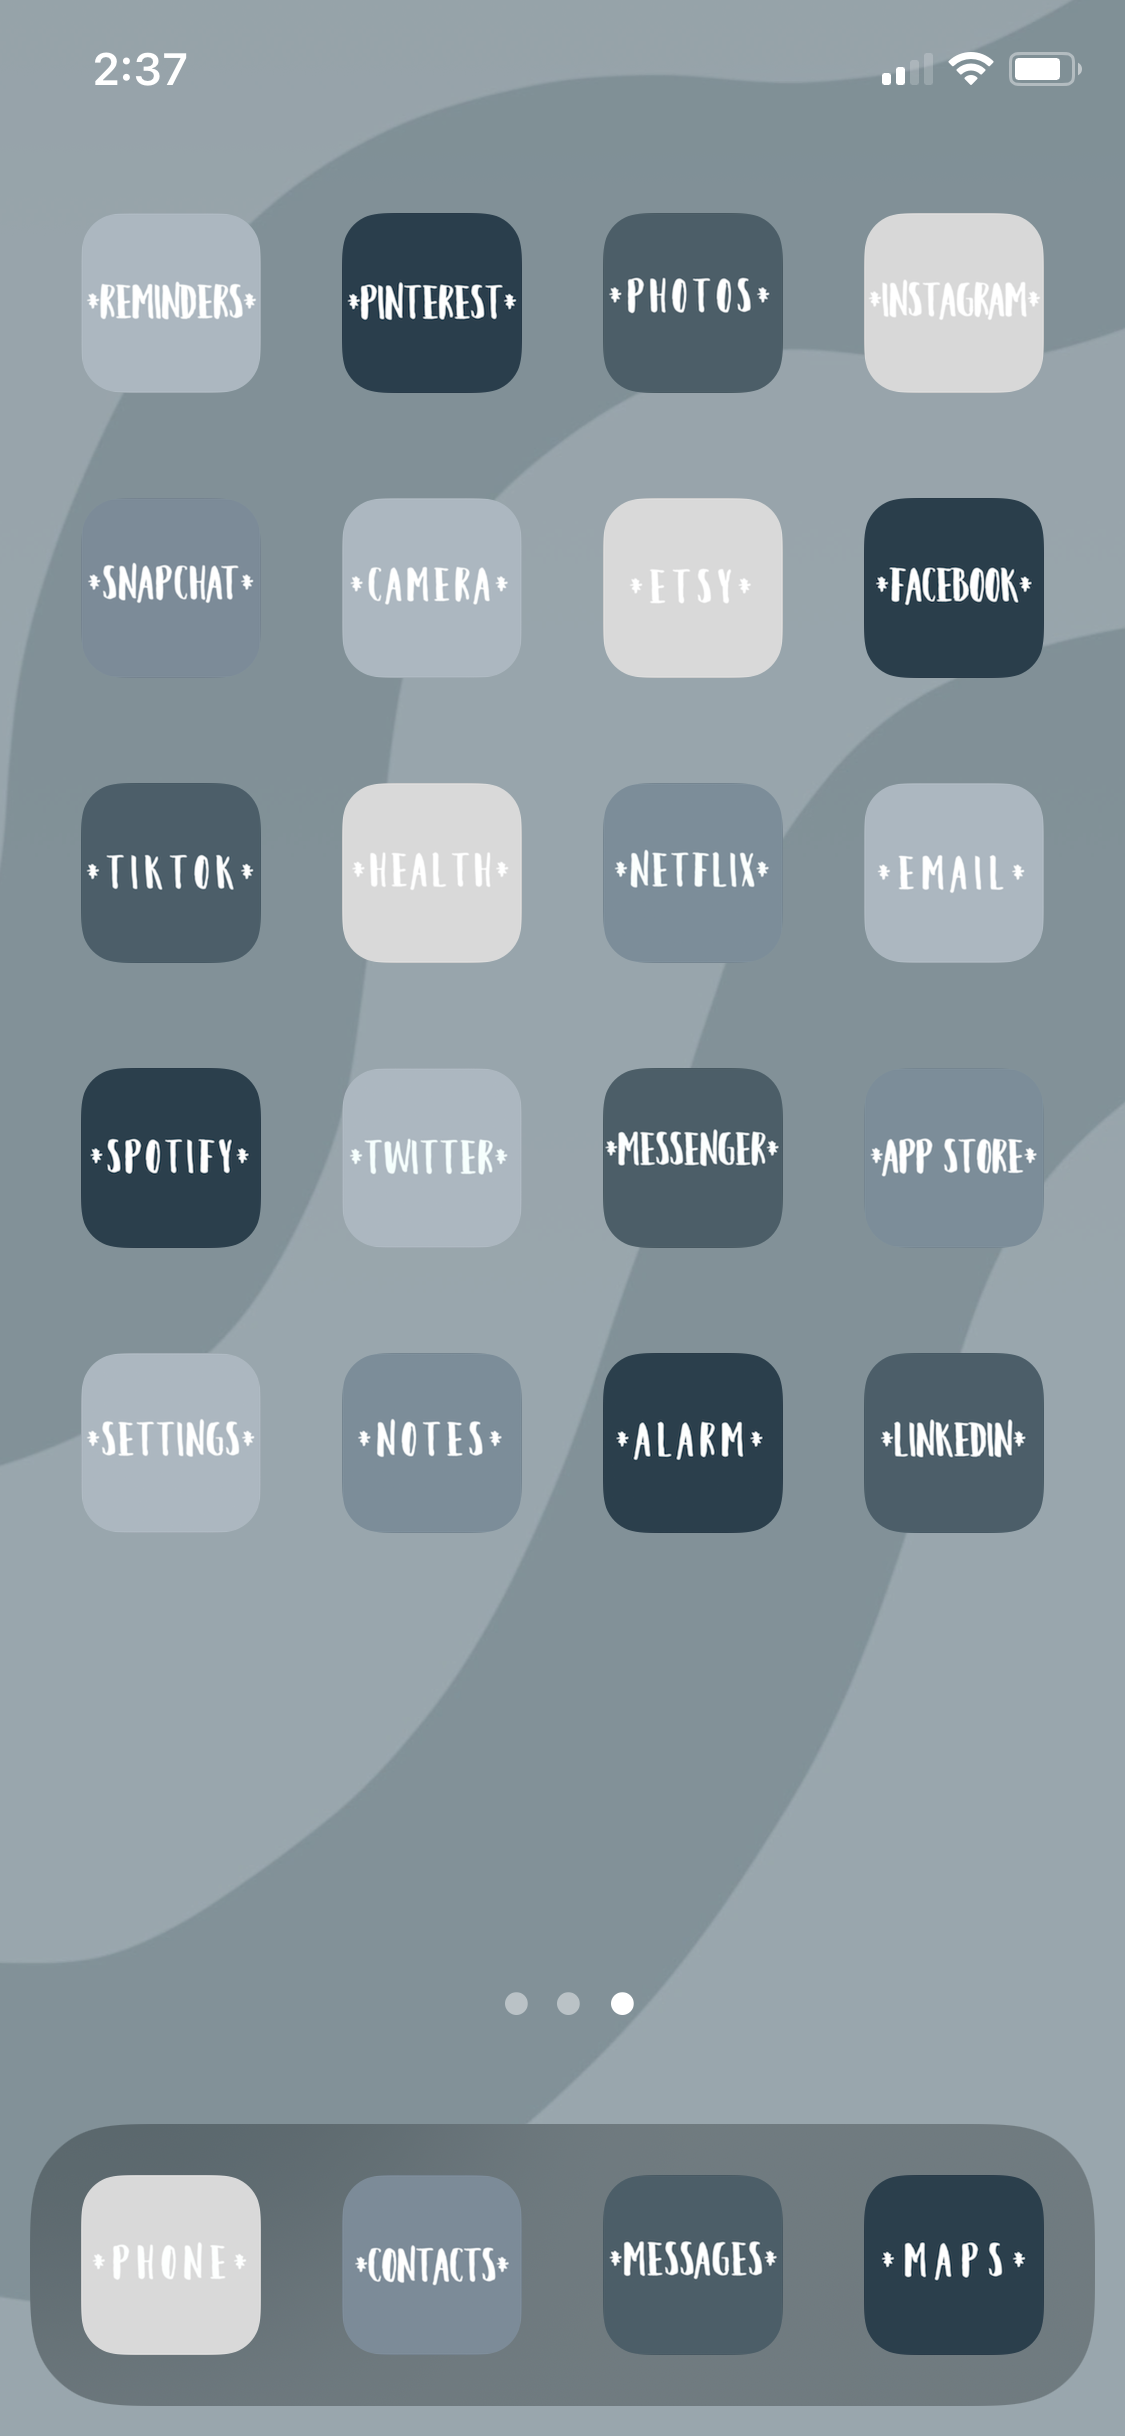 Ios14 App Icons App Icons Iphone App Icons Aesthetic Icons 24 Apps Pack In 2020 App Icon Iphone Apps Iphone Wallpaper App